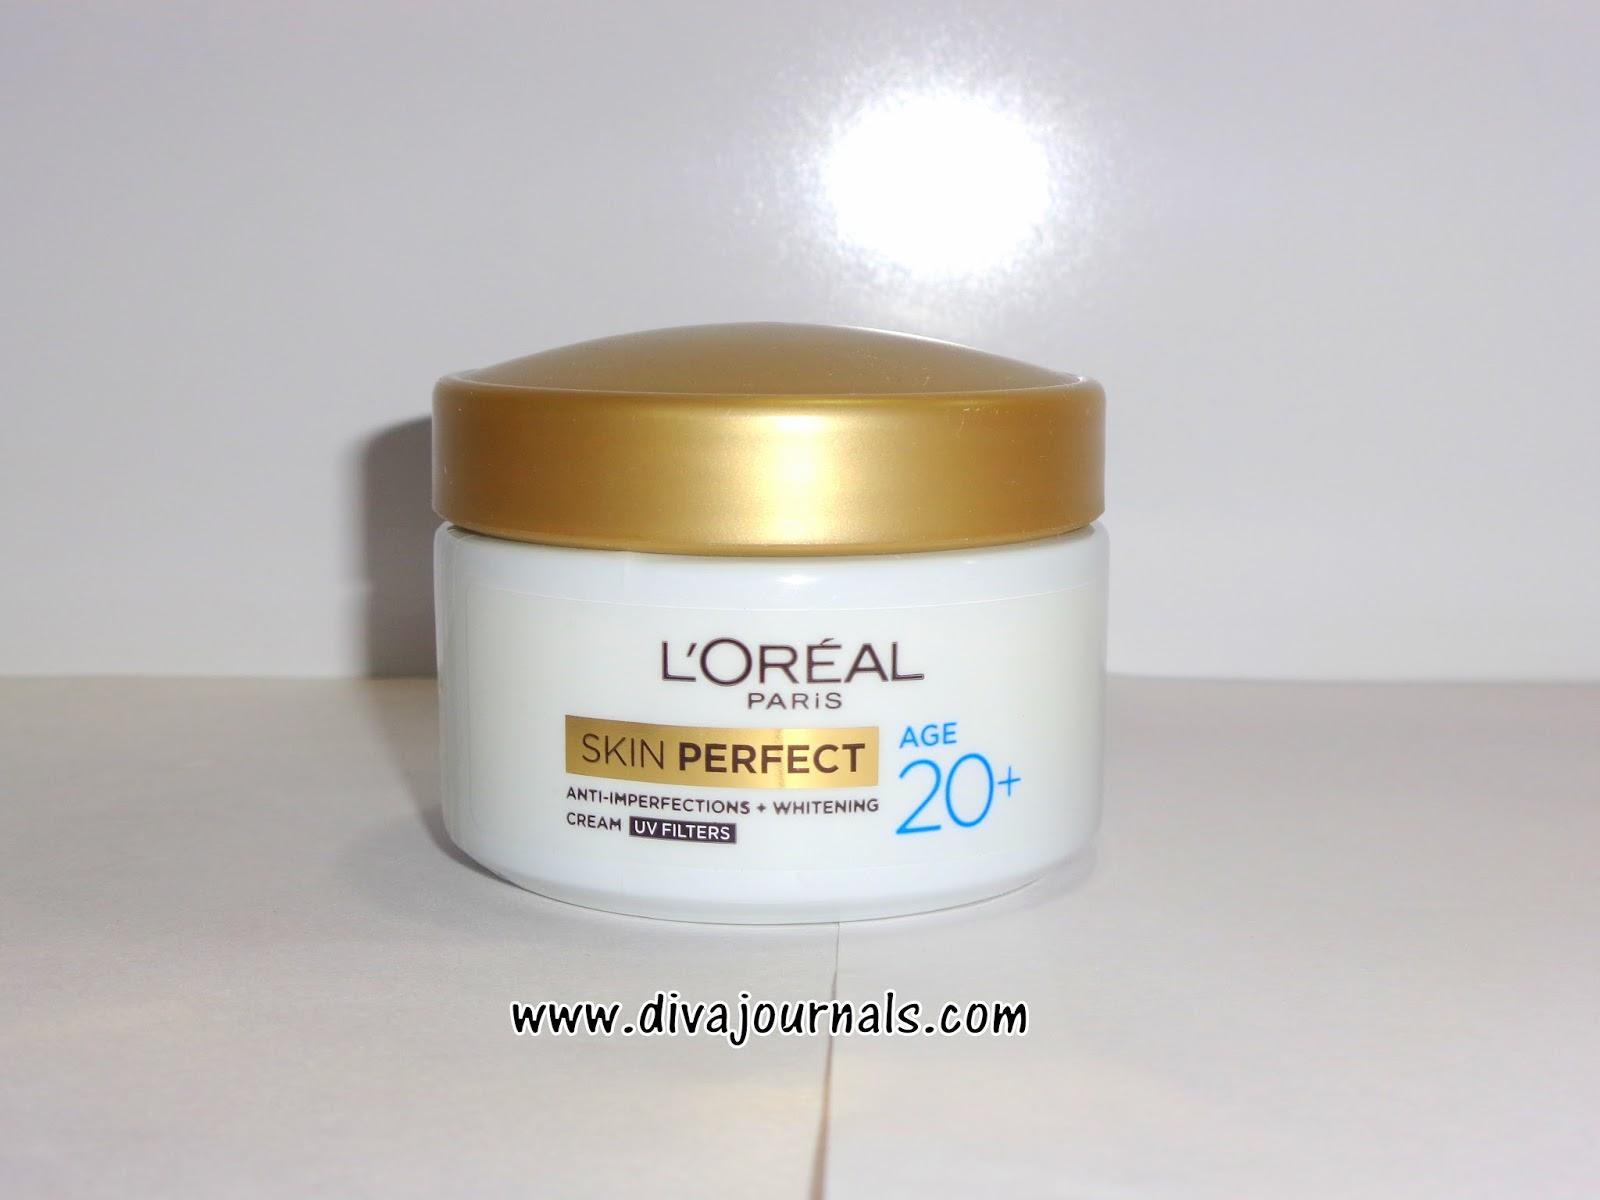 L'oreal Paris Skin Perfect Age 20+ Cream Review